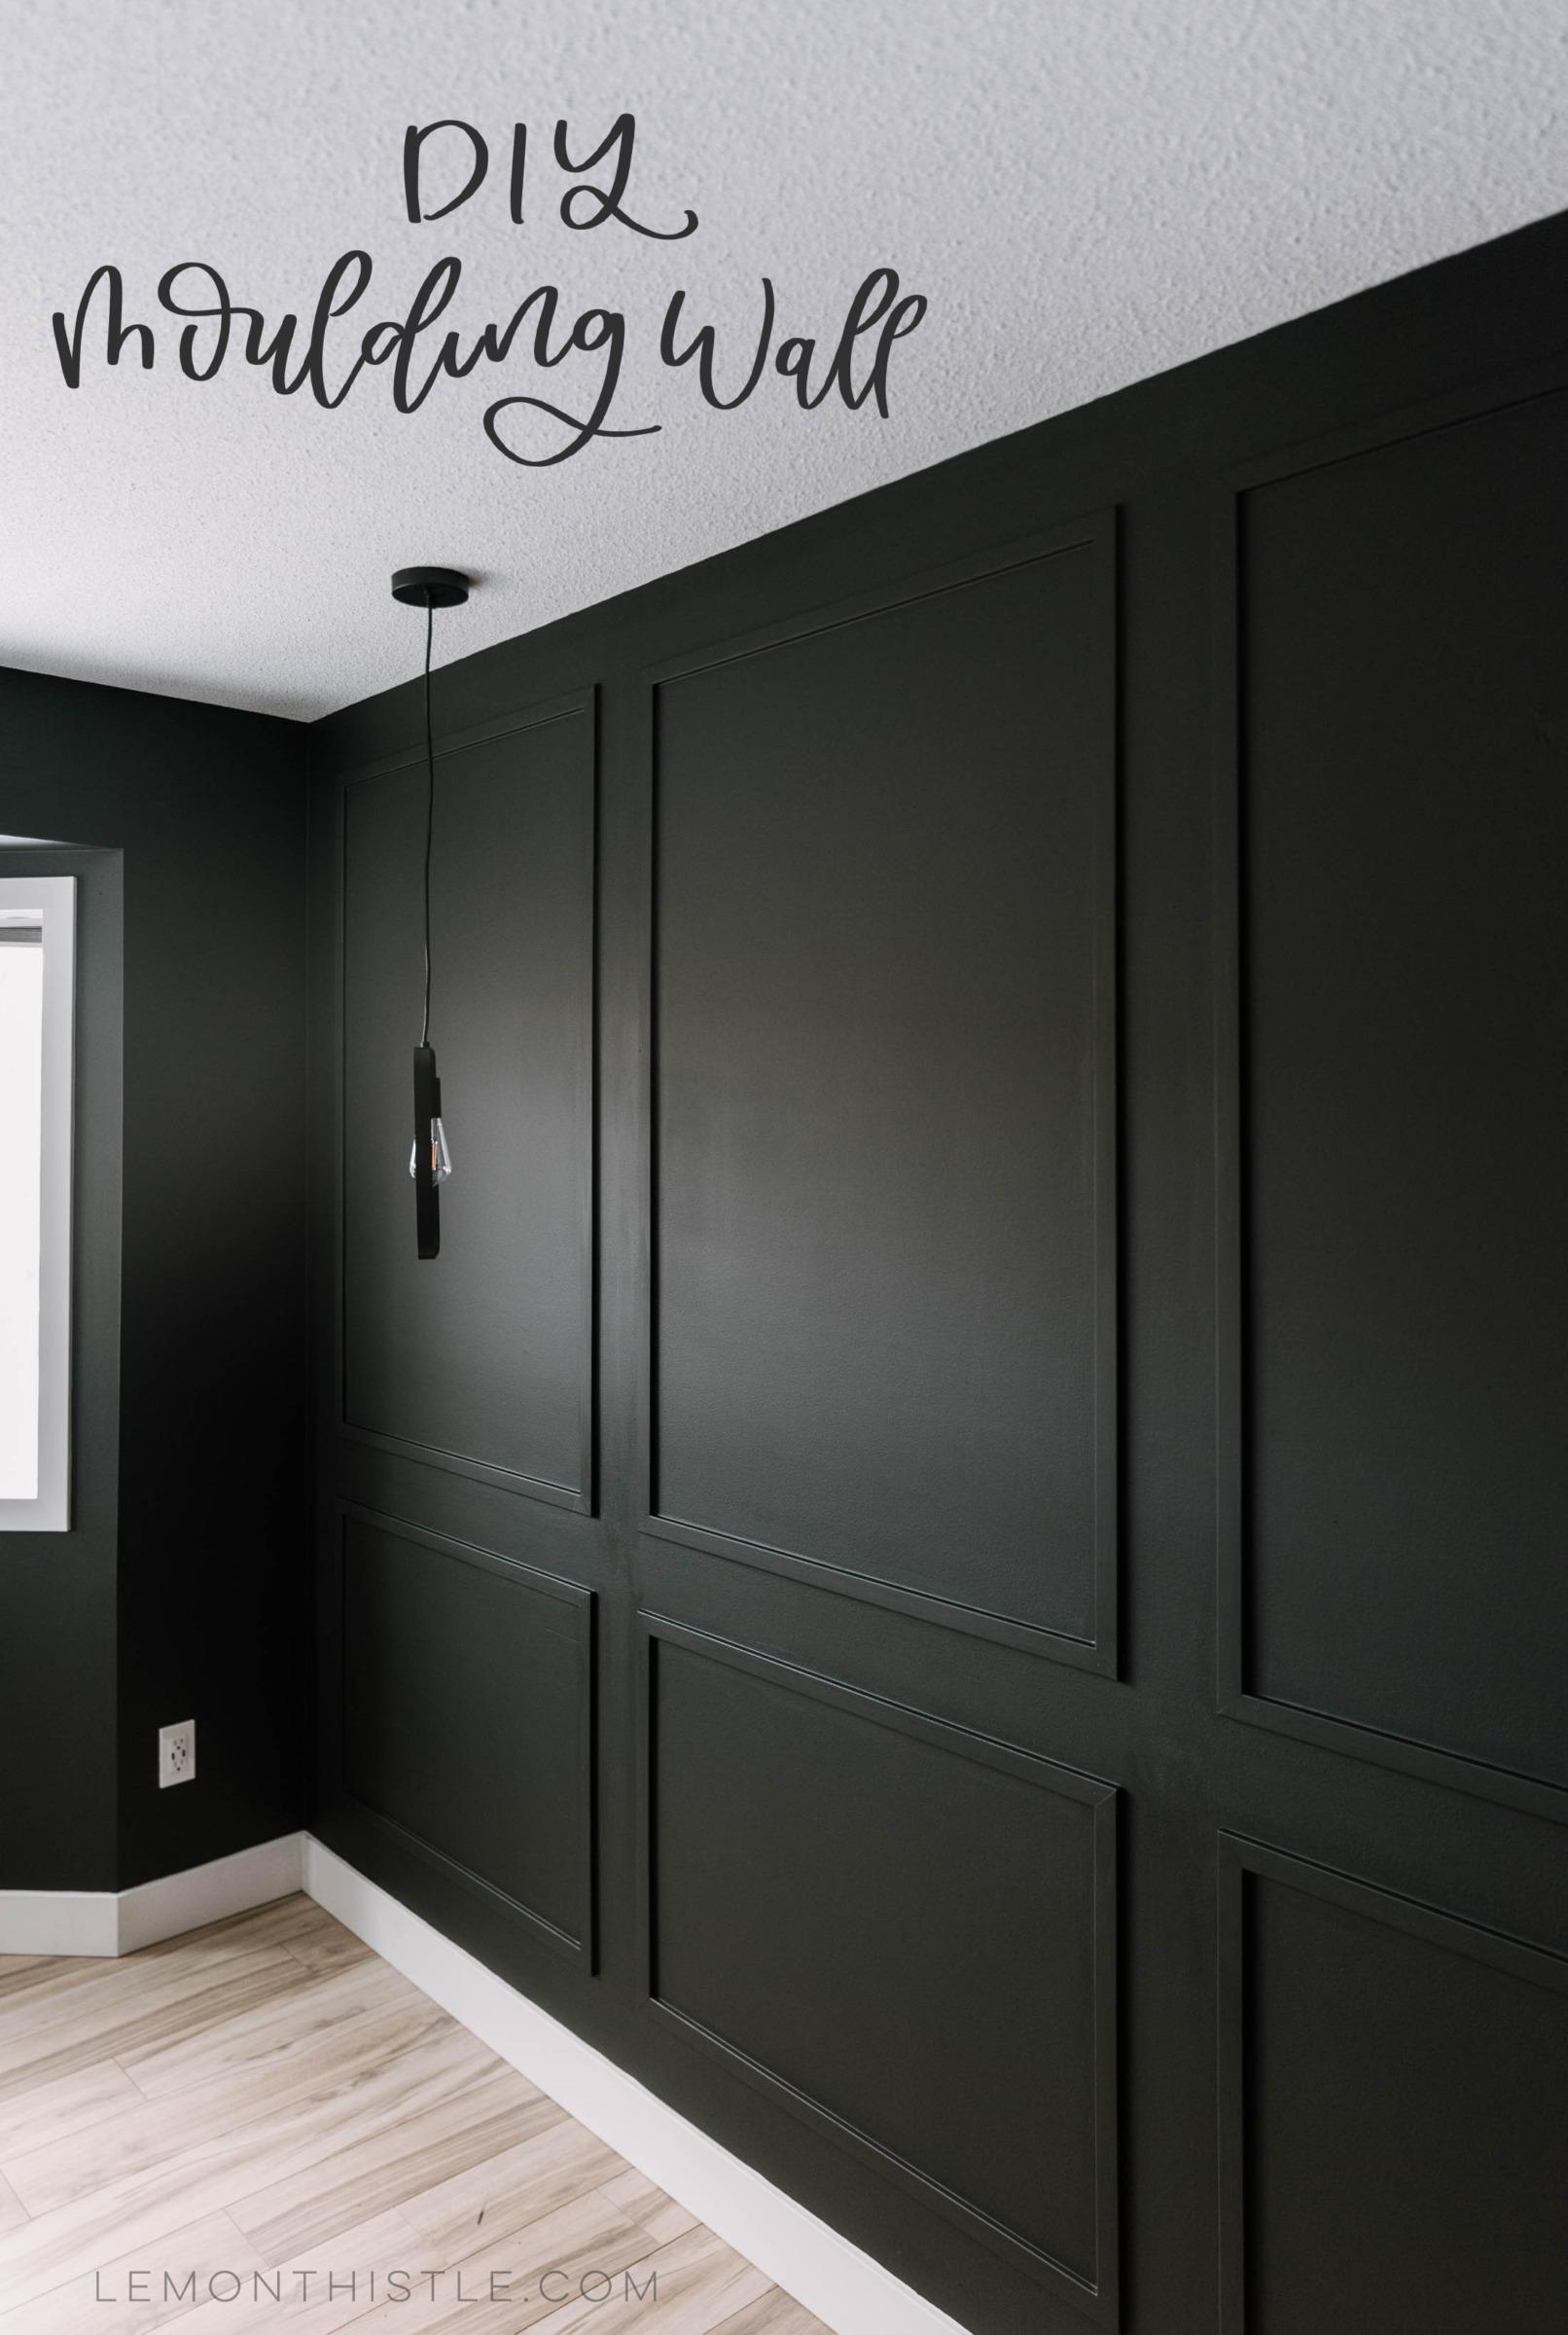 Master Bedroom Diy Moulding Wall Lemon Thistle